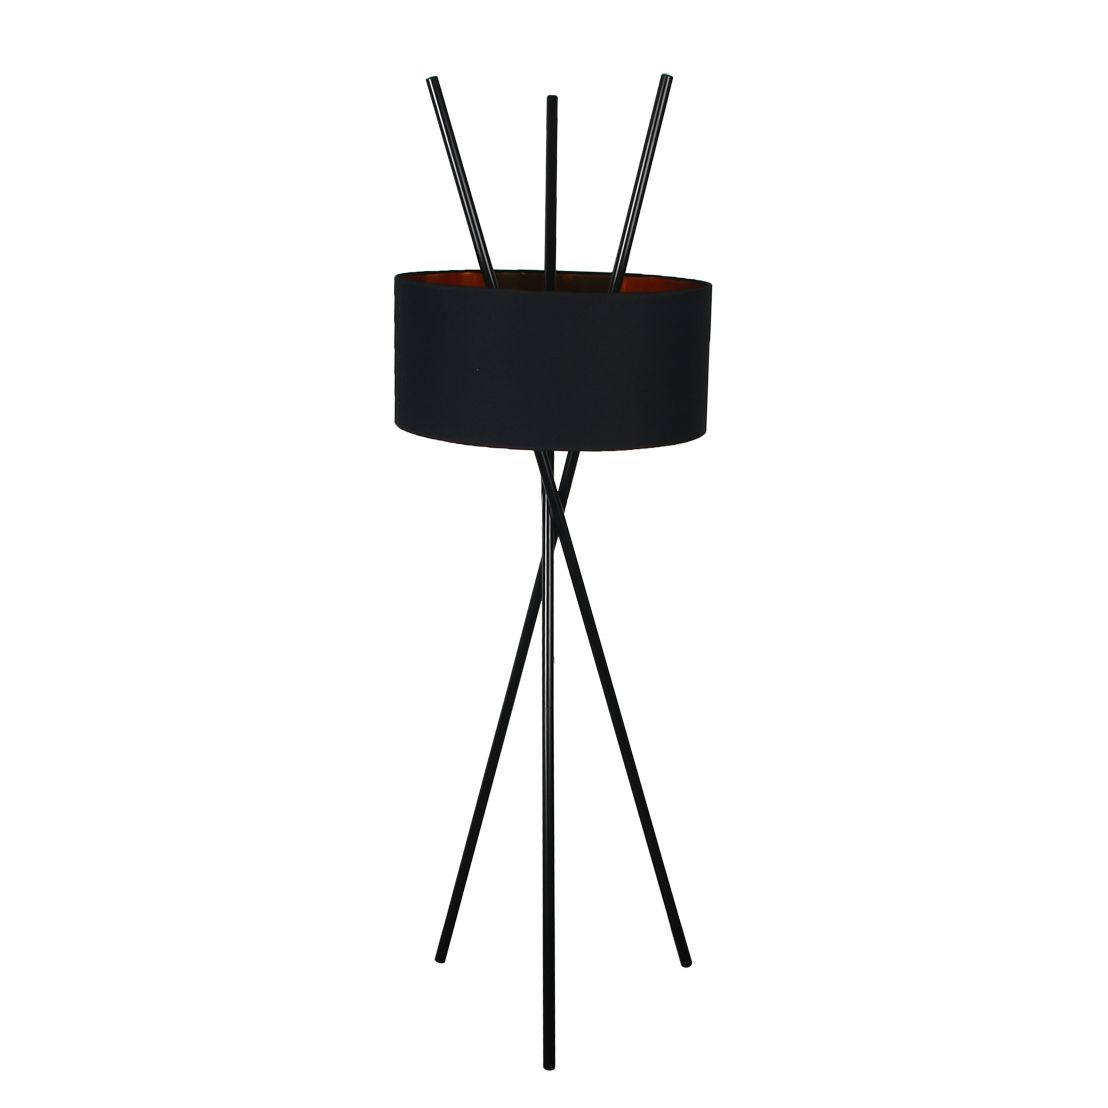 EEK A++, Lampadaire Tripod Aton - Tissu / Métal - 1 ampoule - Noir, Loistaa